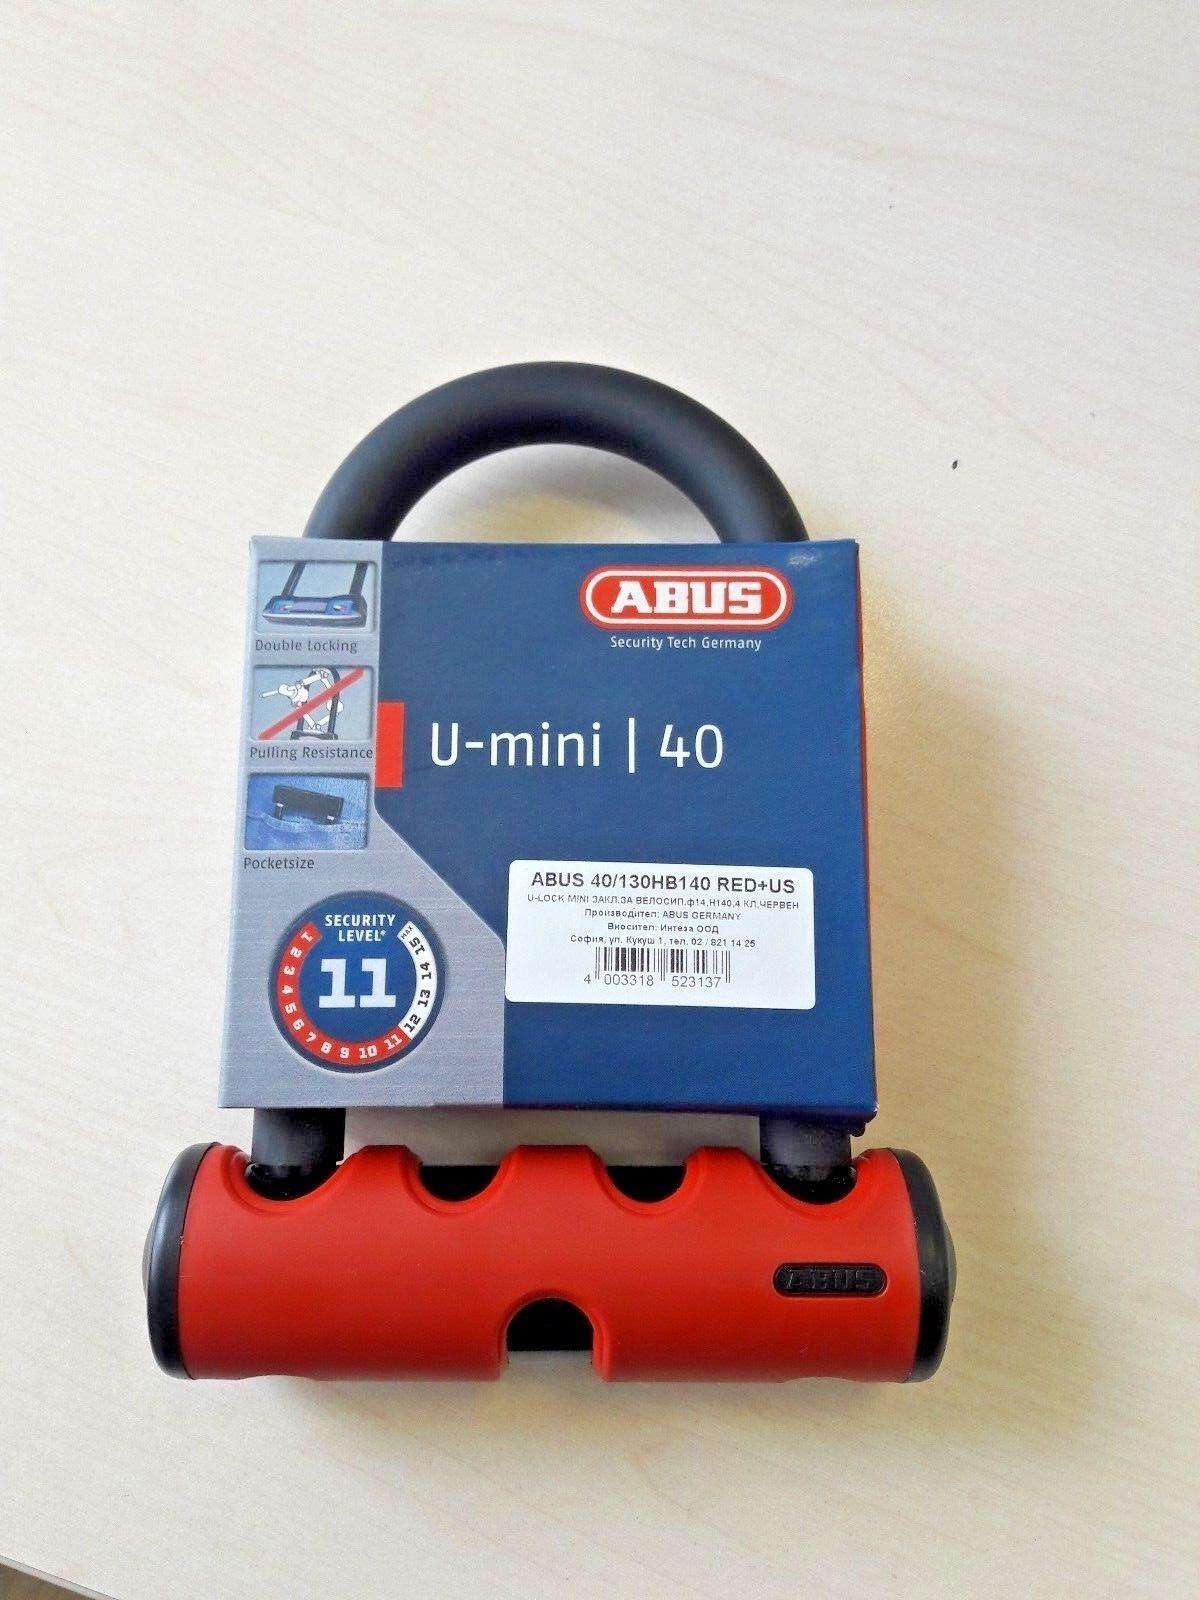 bicicletta Lock Aautobus 40130HB140 UMini ULock